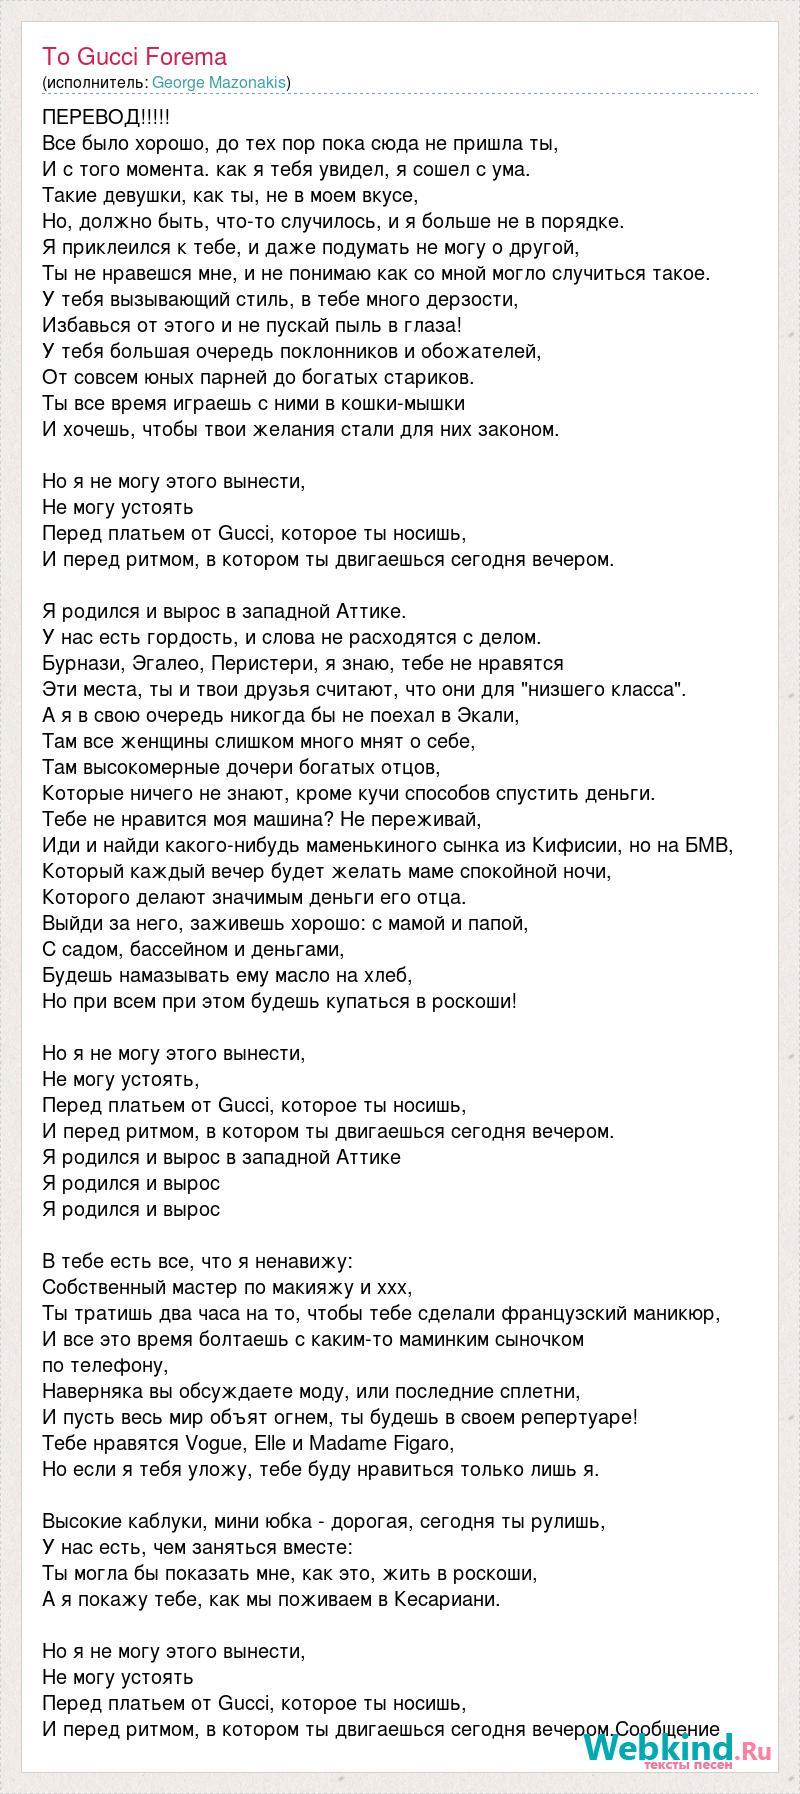 George Mazonakis  To Gucci Forema слова песни f74c1715135